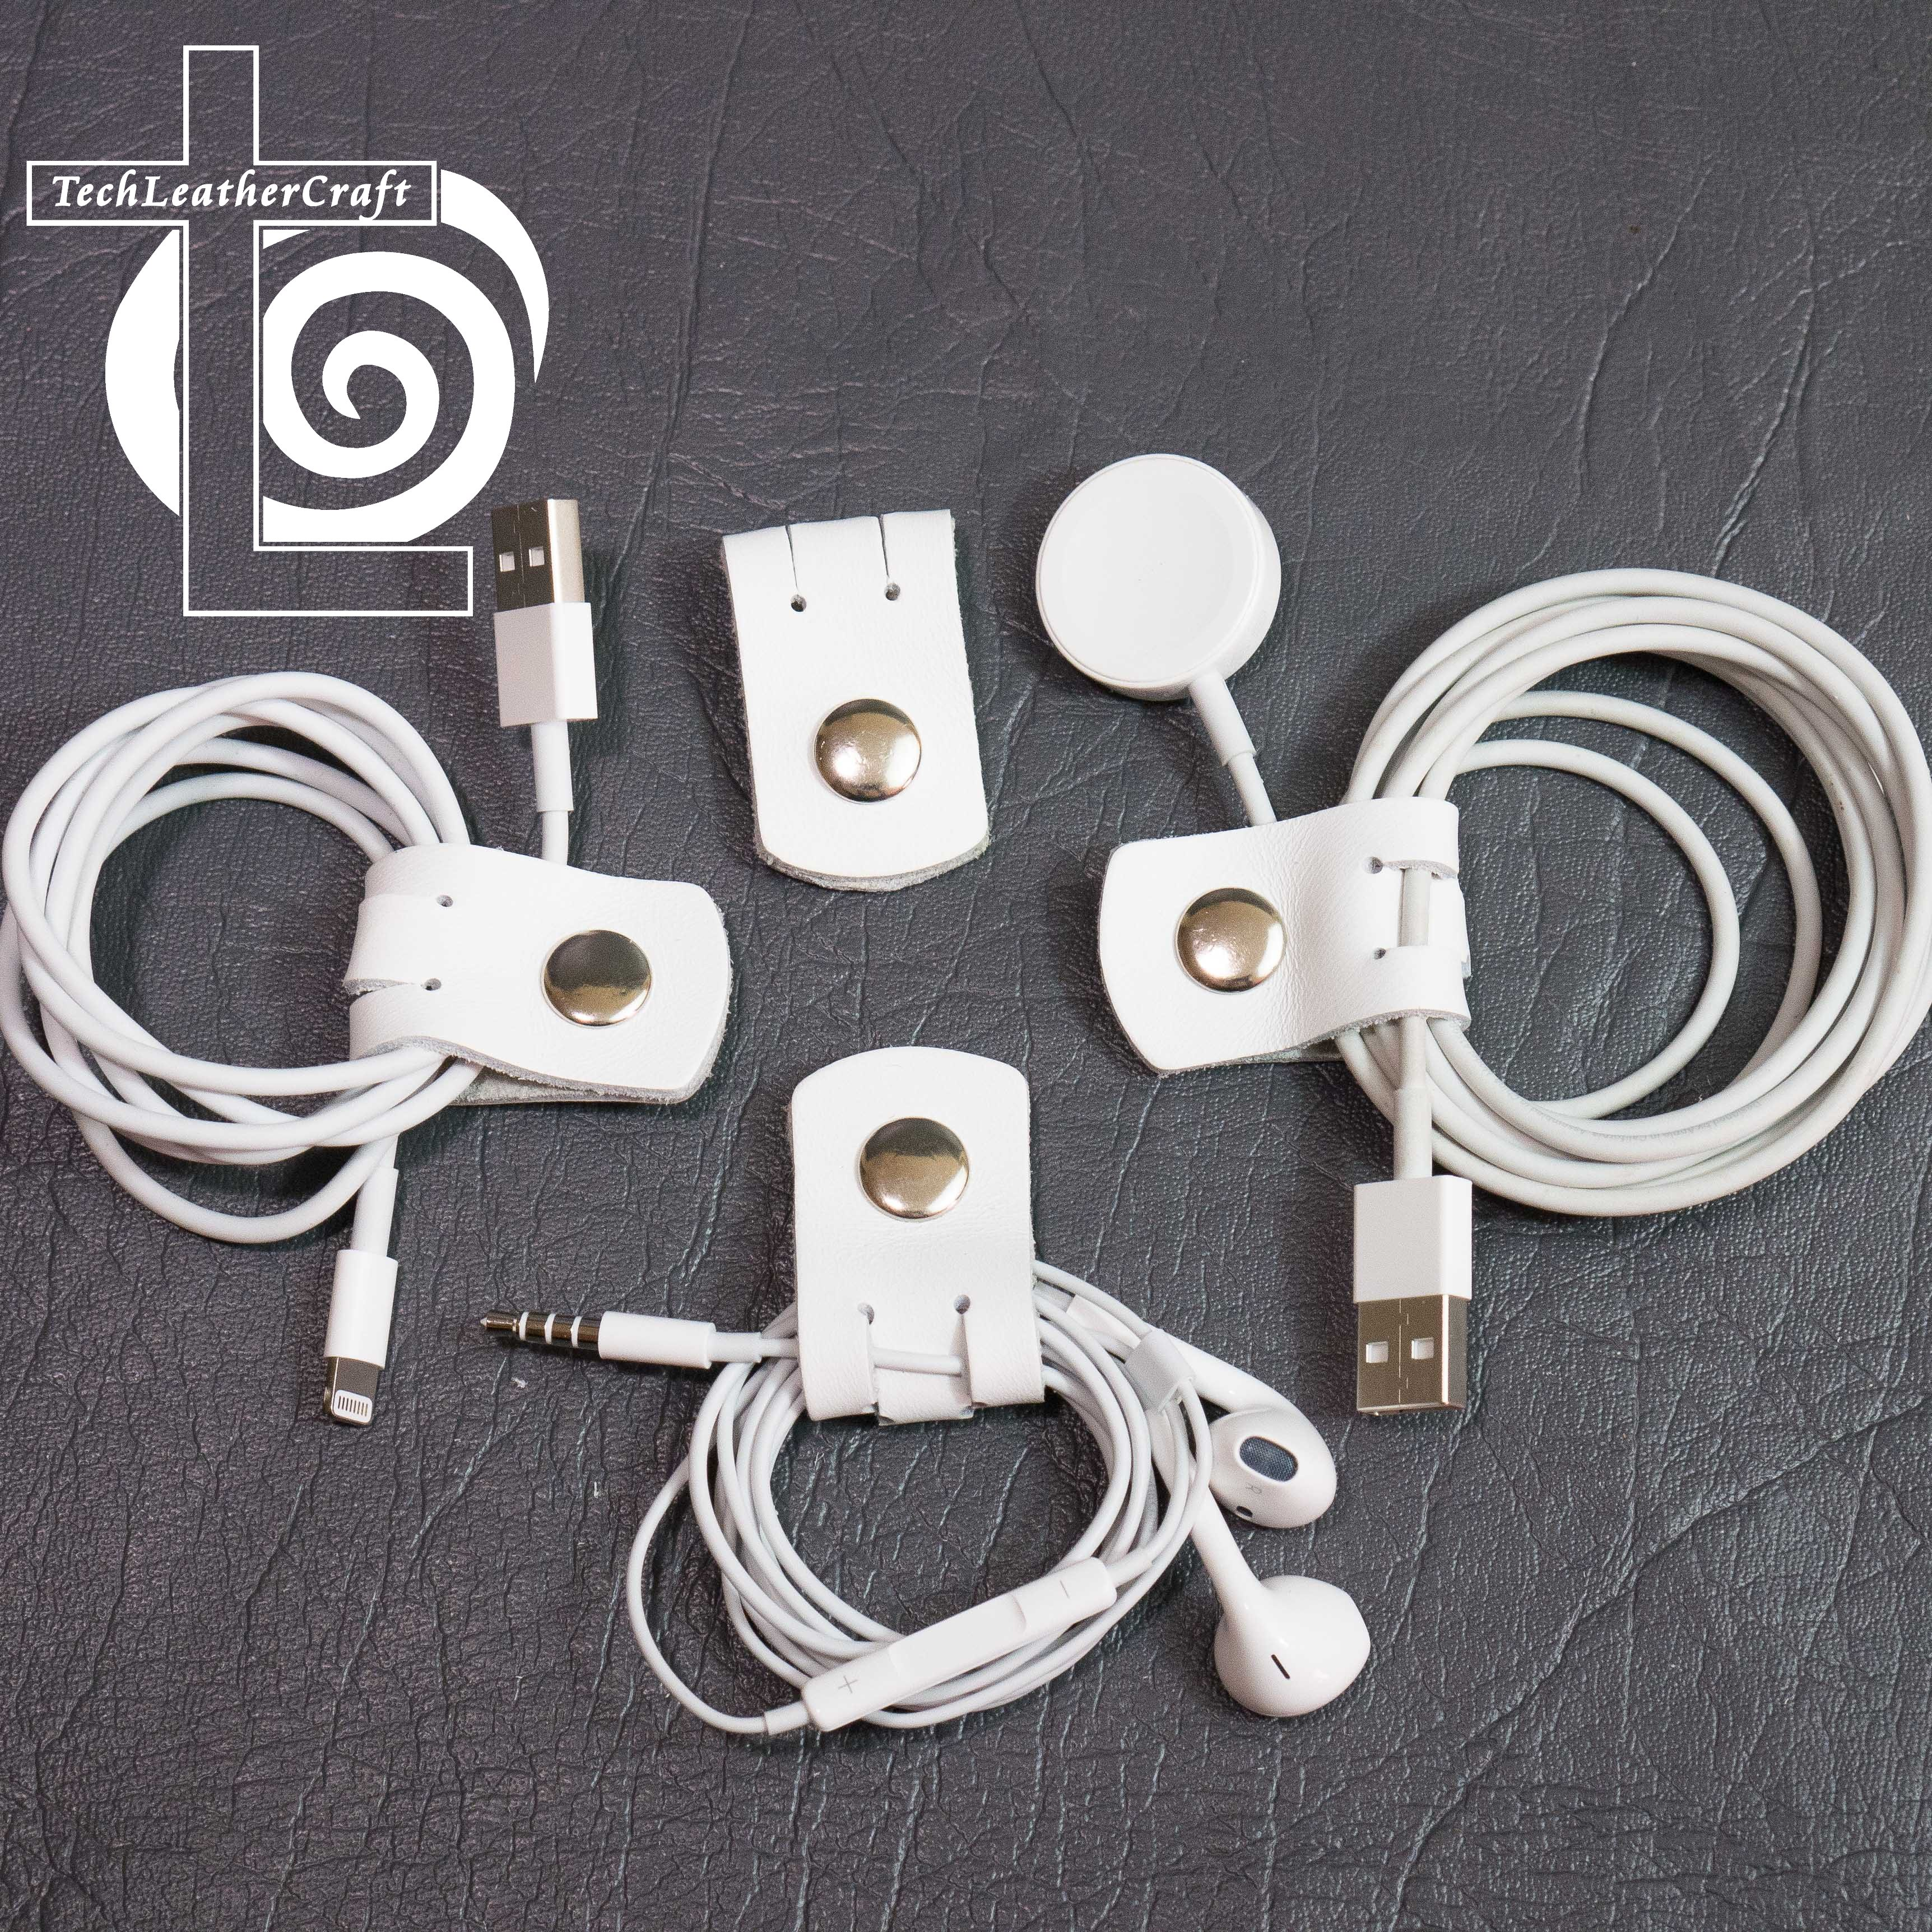 Apple earbuds accessories - black apple lightning earbuds